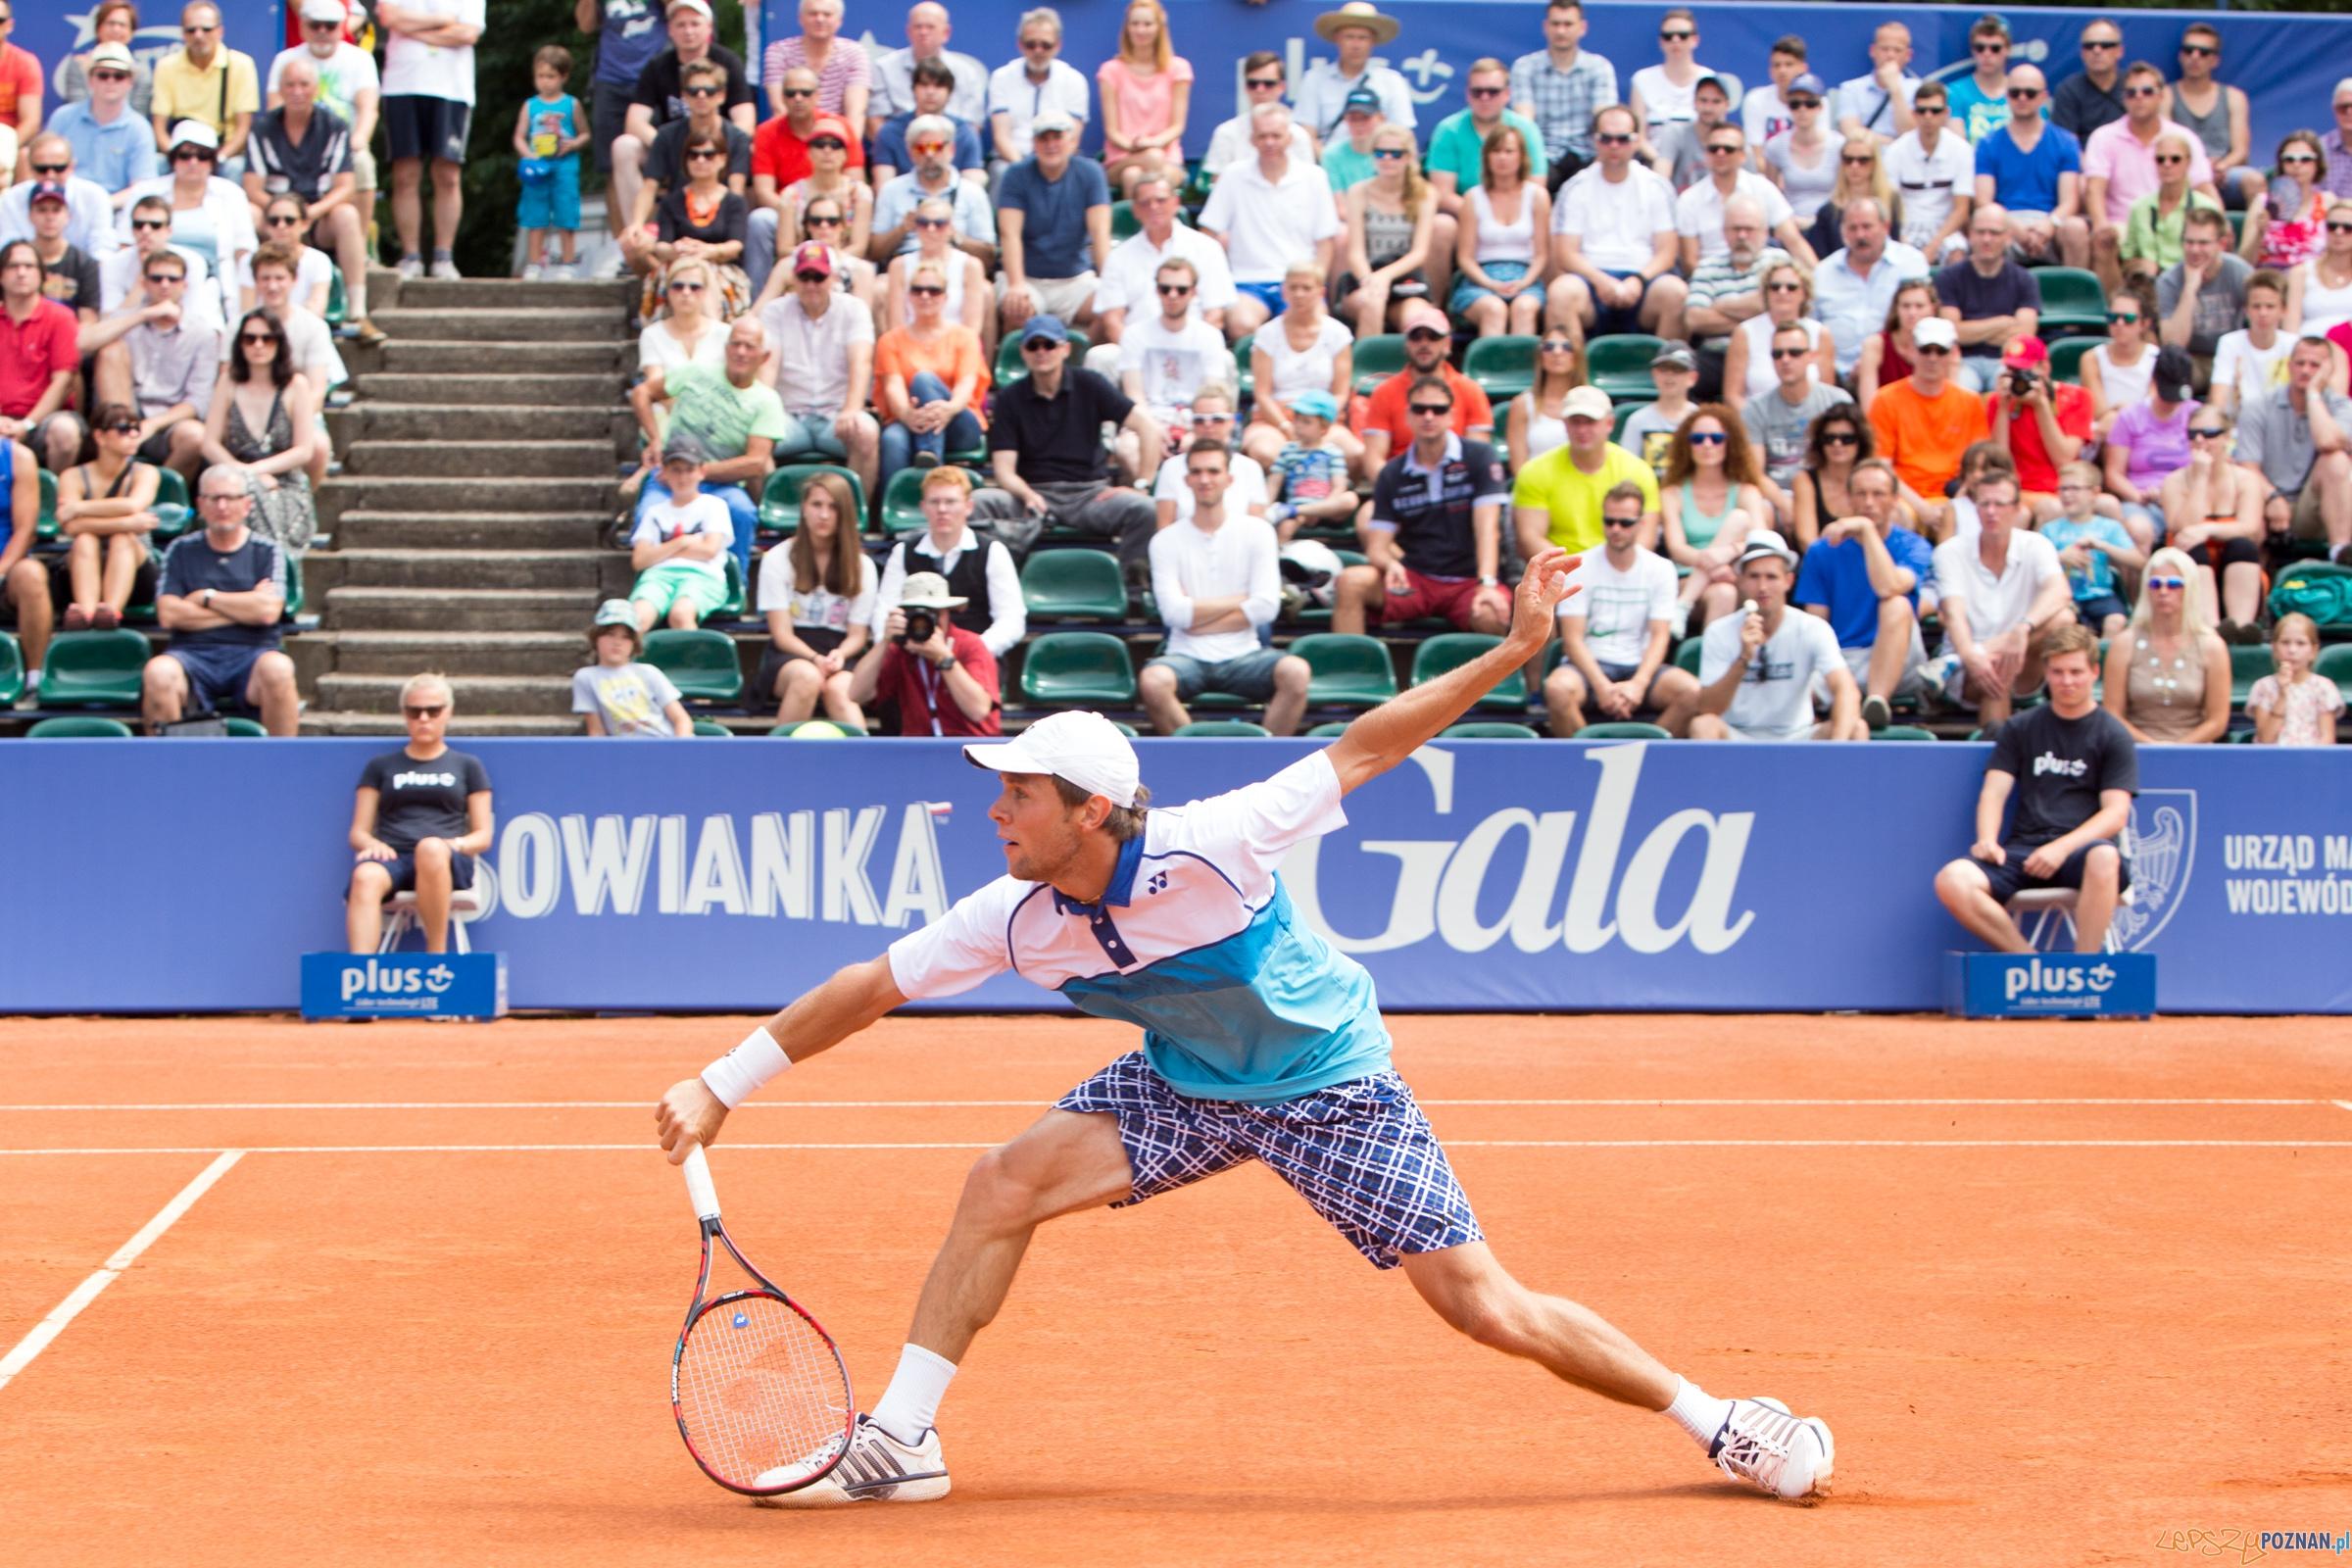 Poznan Open 2015 - Pablo Carreno Busta vs Radu Albot  Foto: lepszyPOZNAN.pl / Piotr Rychter